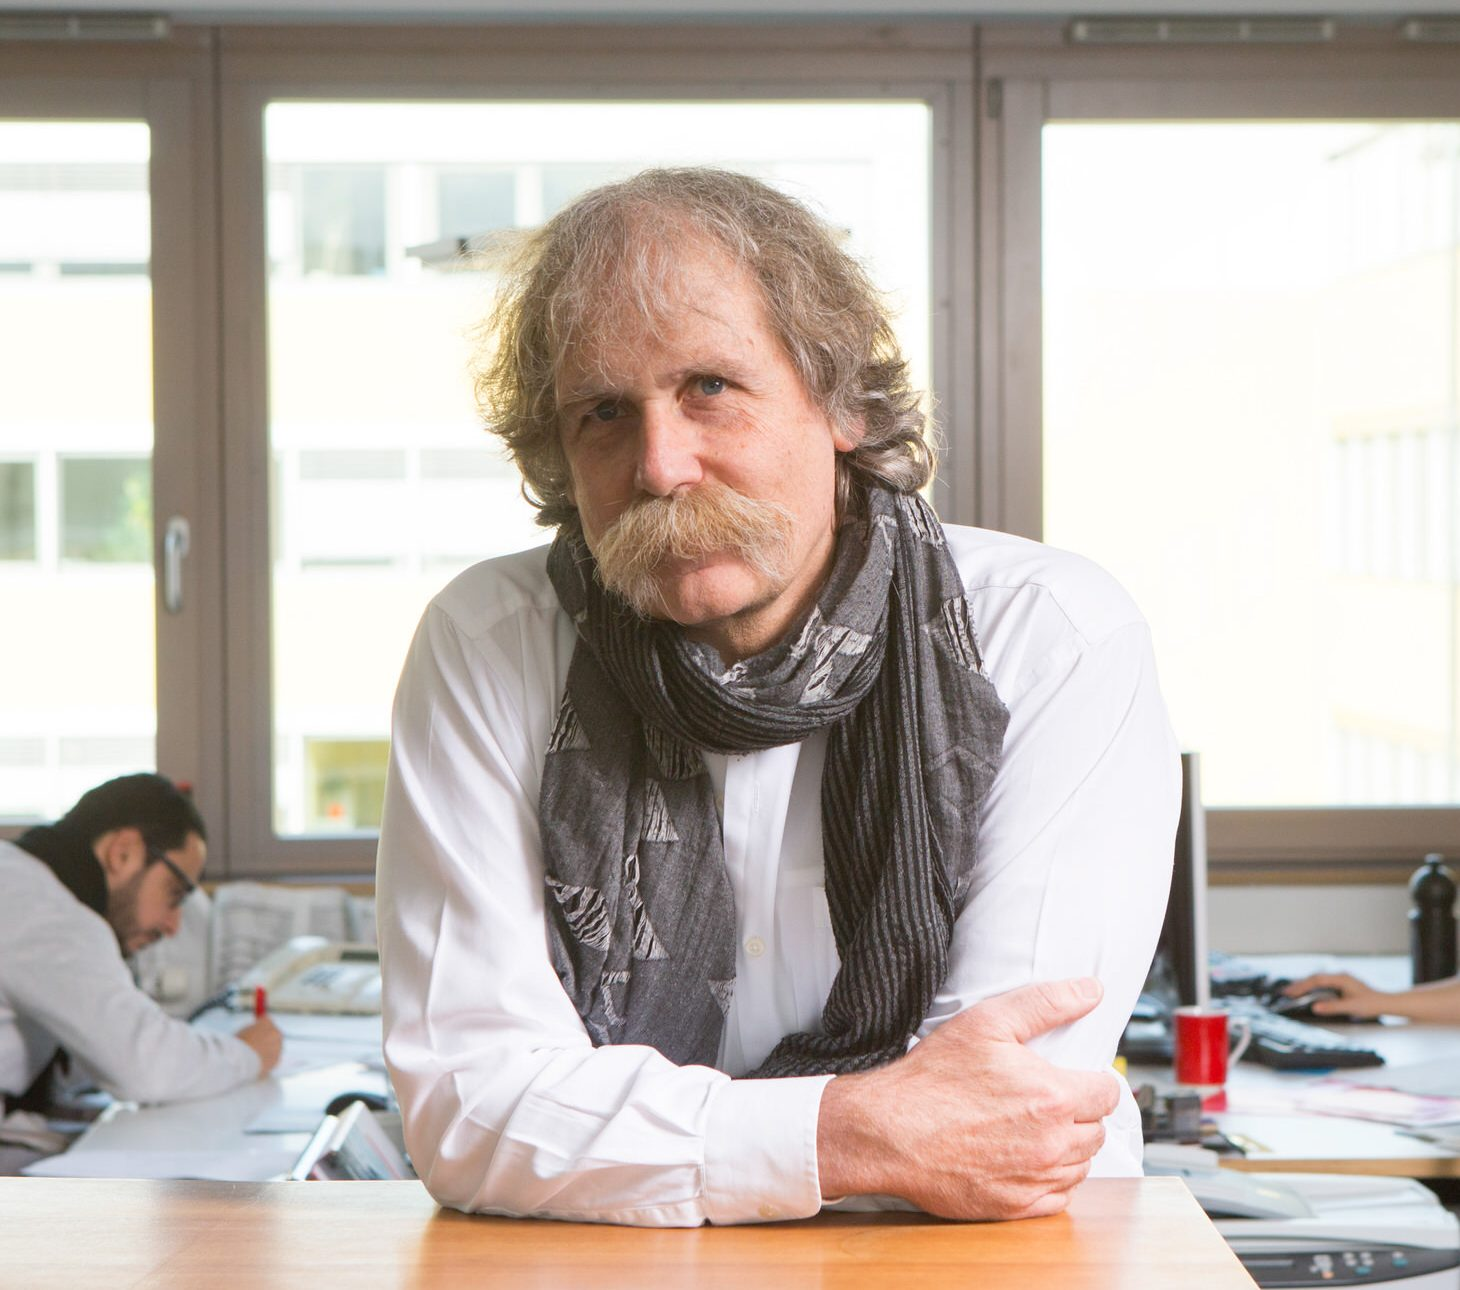 Prof. Aux. UCLV Rolf C. Buschmann